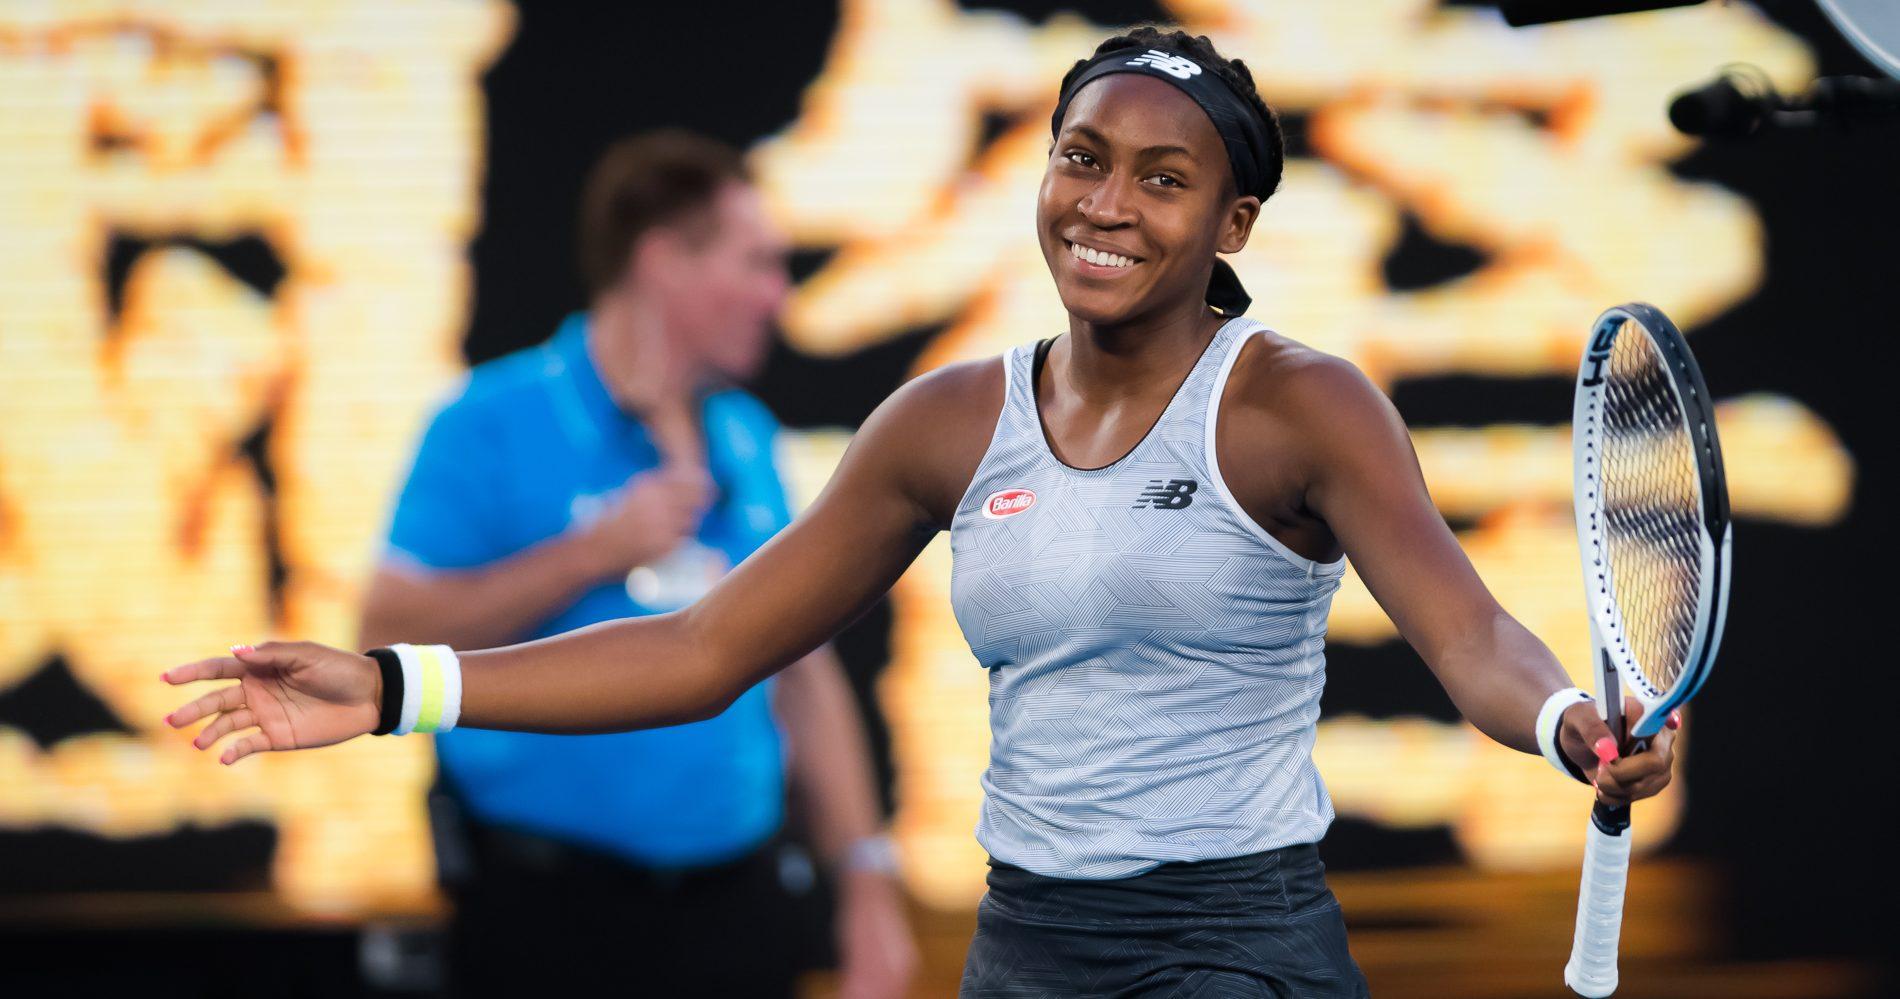 Cori Gauff of the United States after winning her third round match at the 2020 Australian Open Grand Slam tennis tournament against Naomi Osaka of Japan